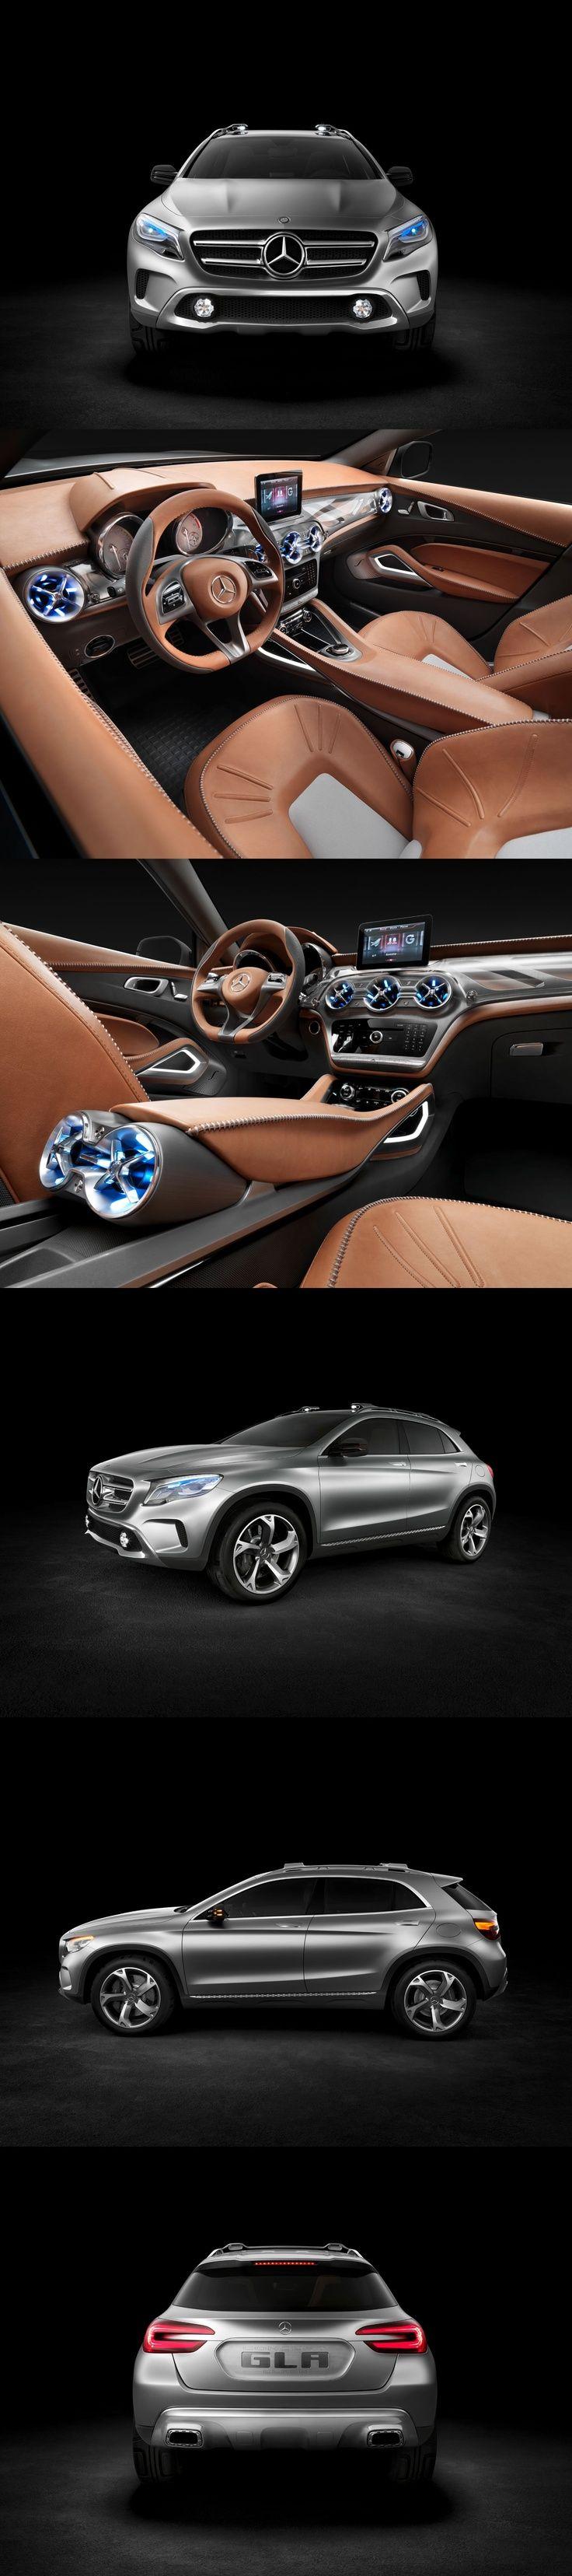 Suv auto - I want this...uhhh...so badly! Mercedes-Benz GLA